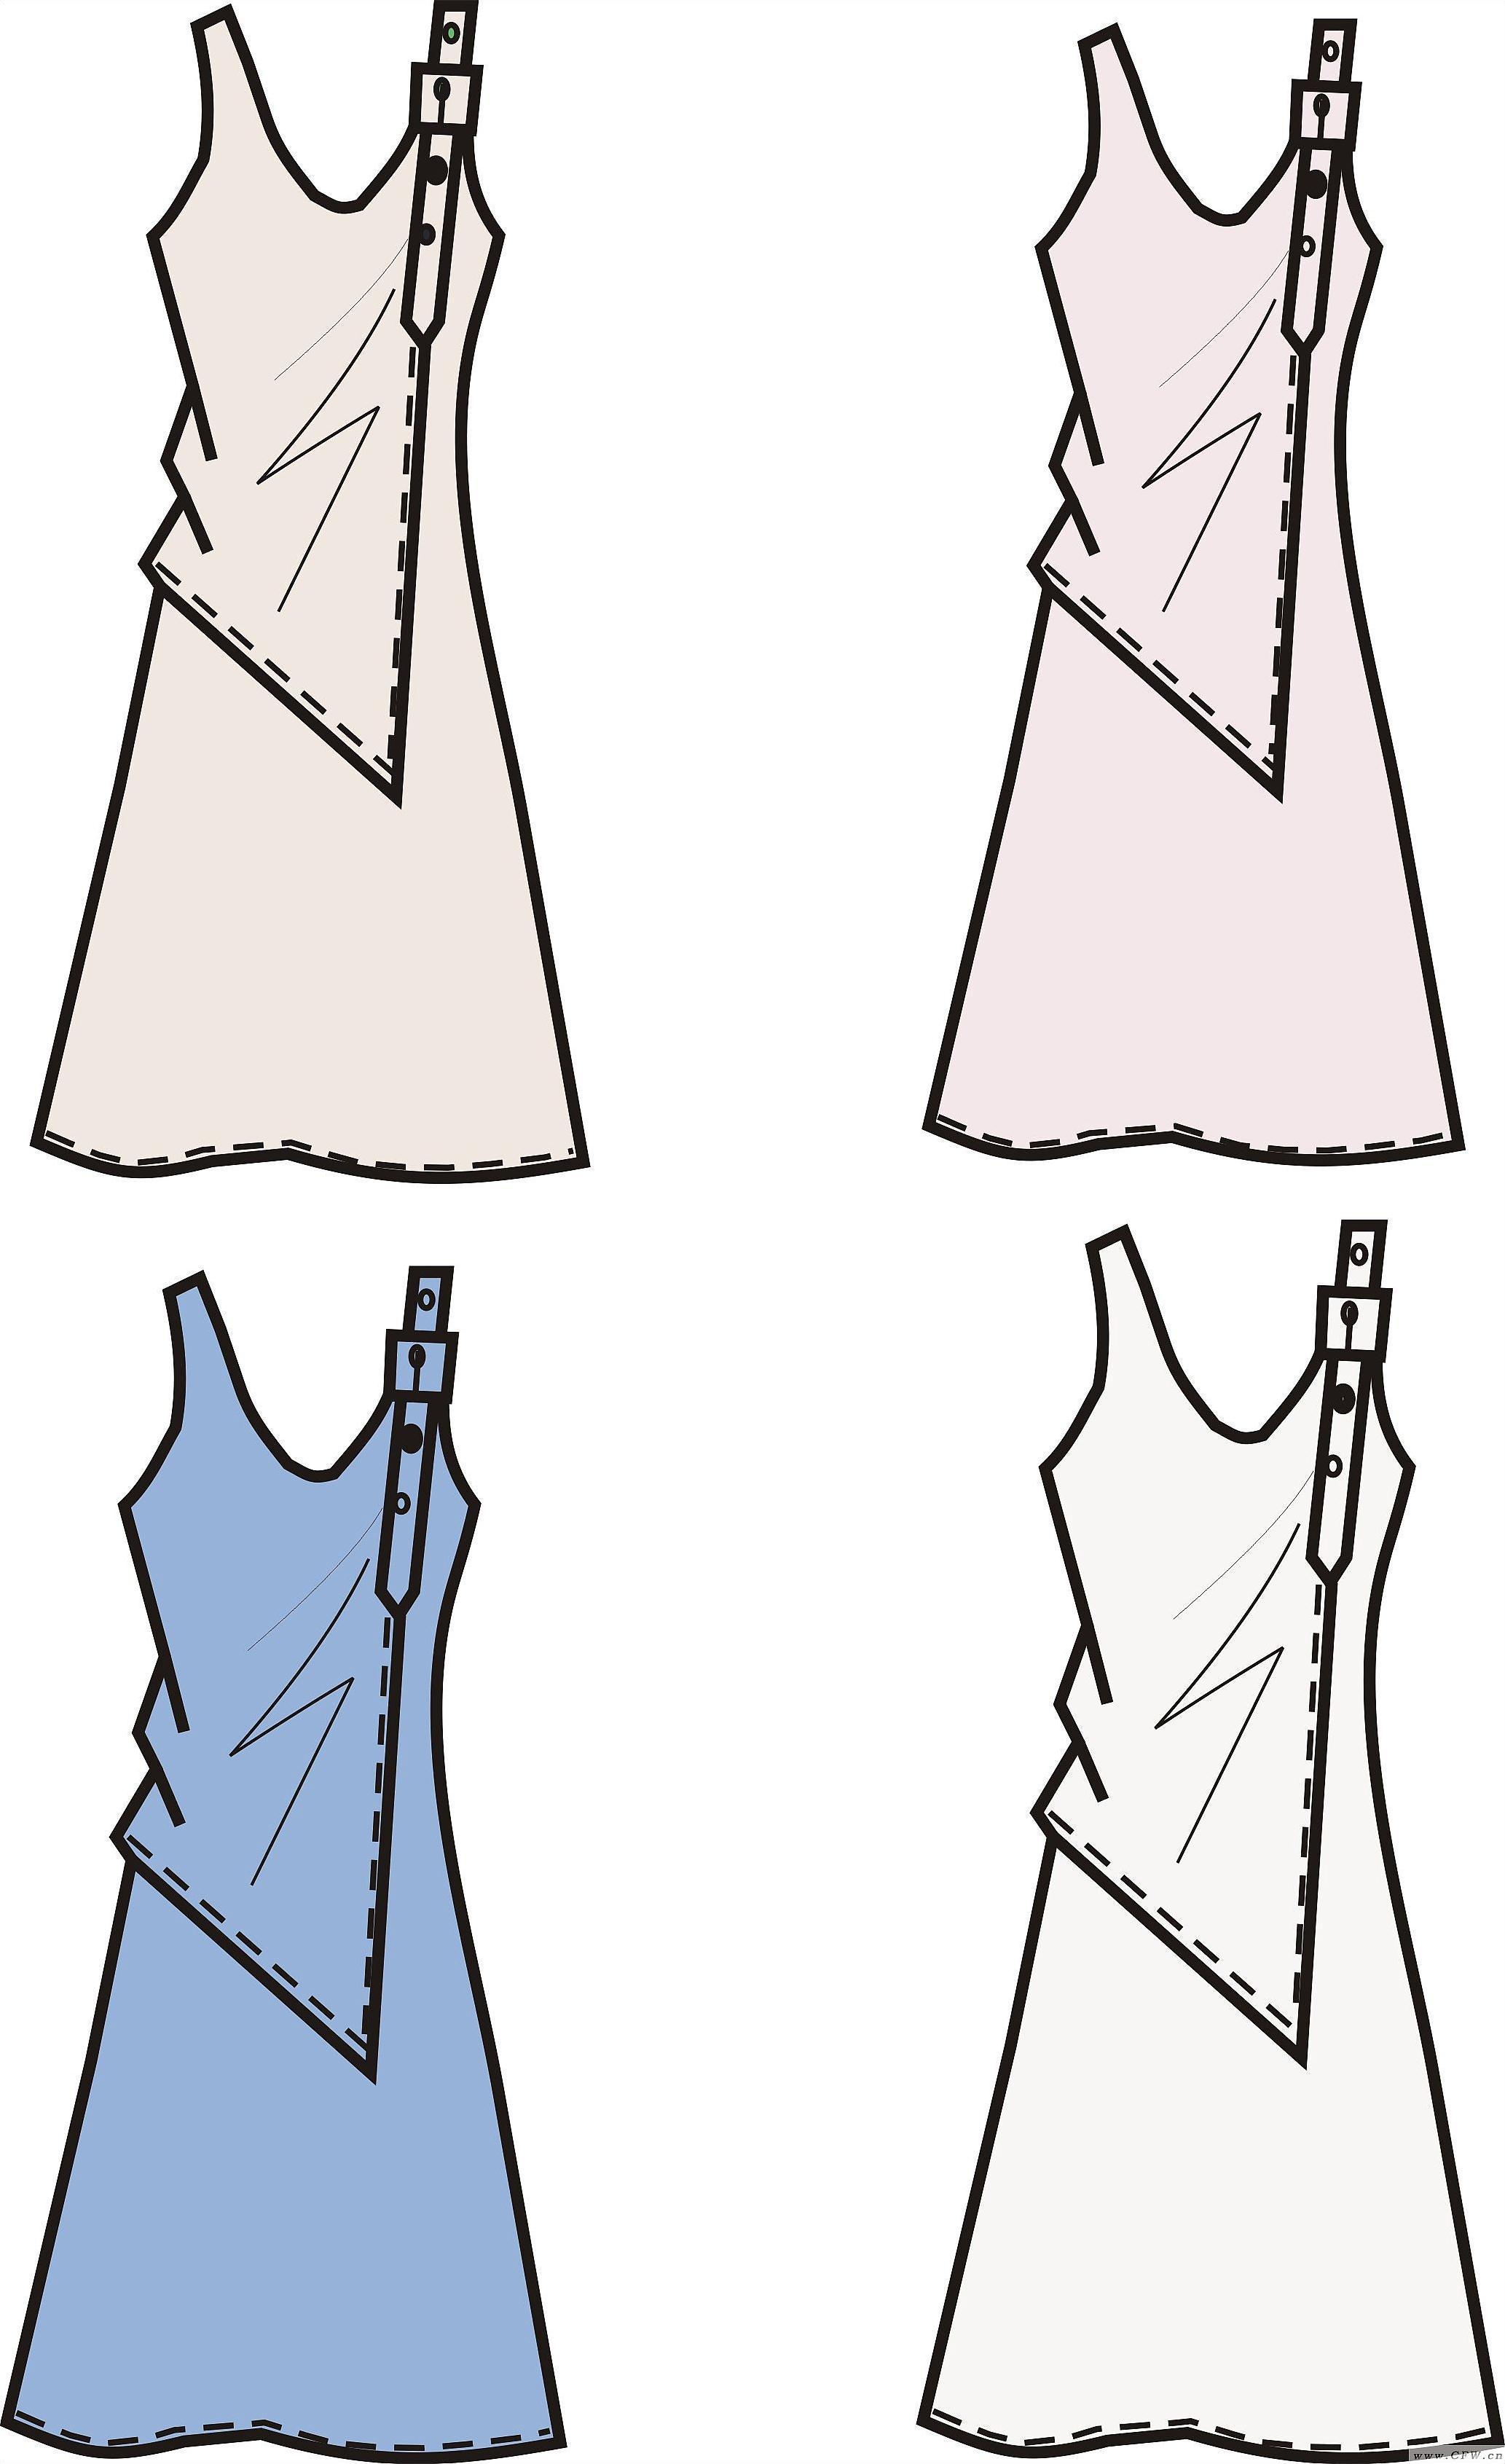 coreldraw女装裙作品-coreldraw女装裙款式图